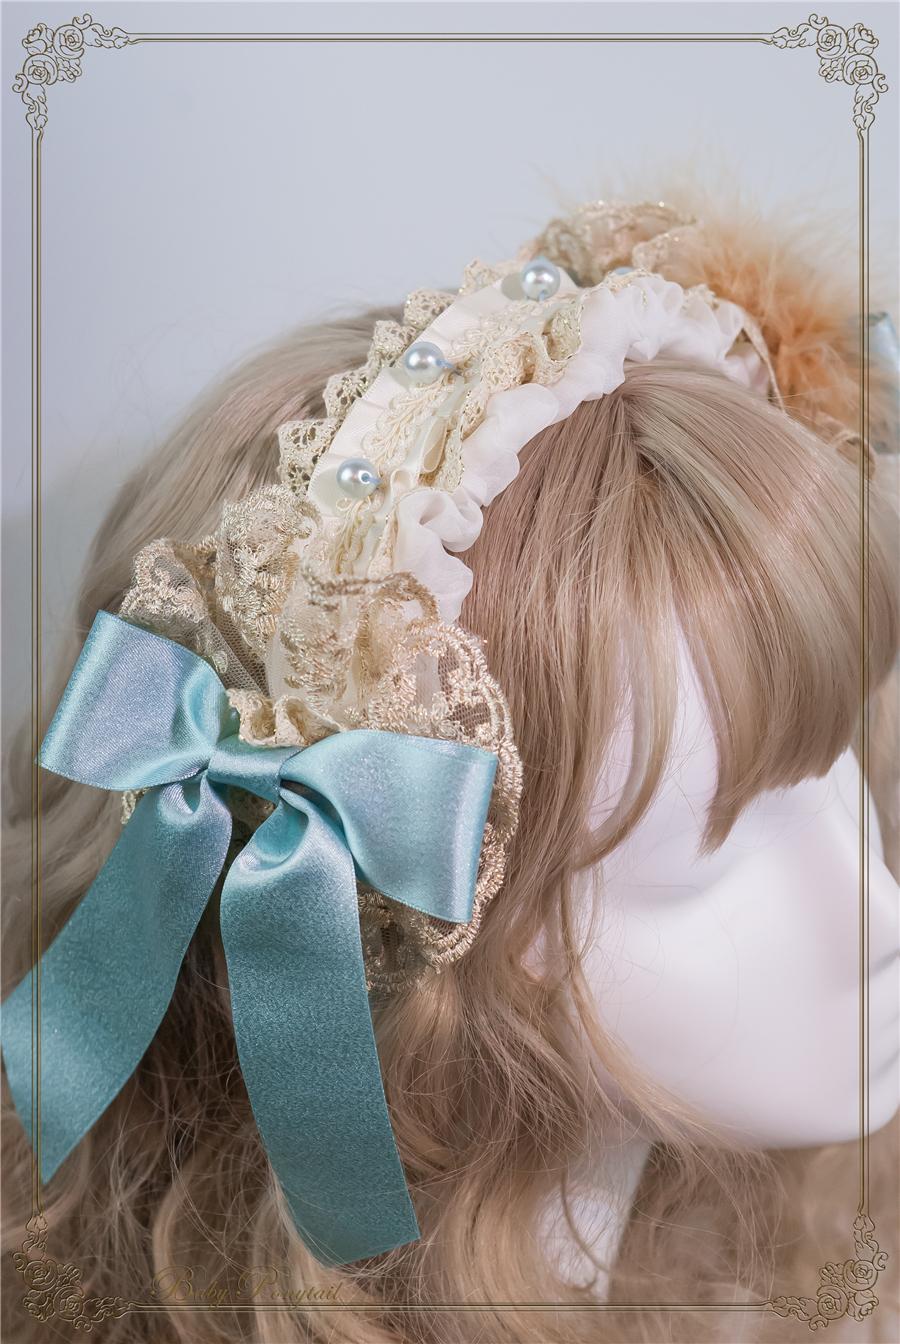 Baby Ponytail_Stock photo_Circus Princess_Rose Head Dress Sax_06.jpg